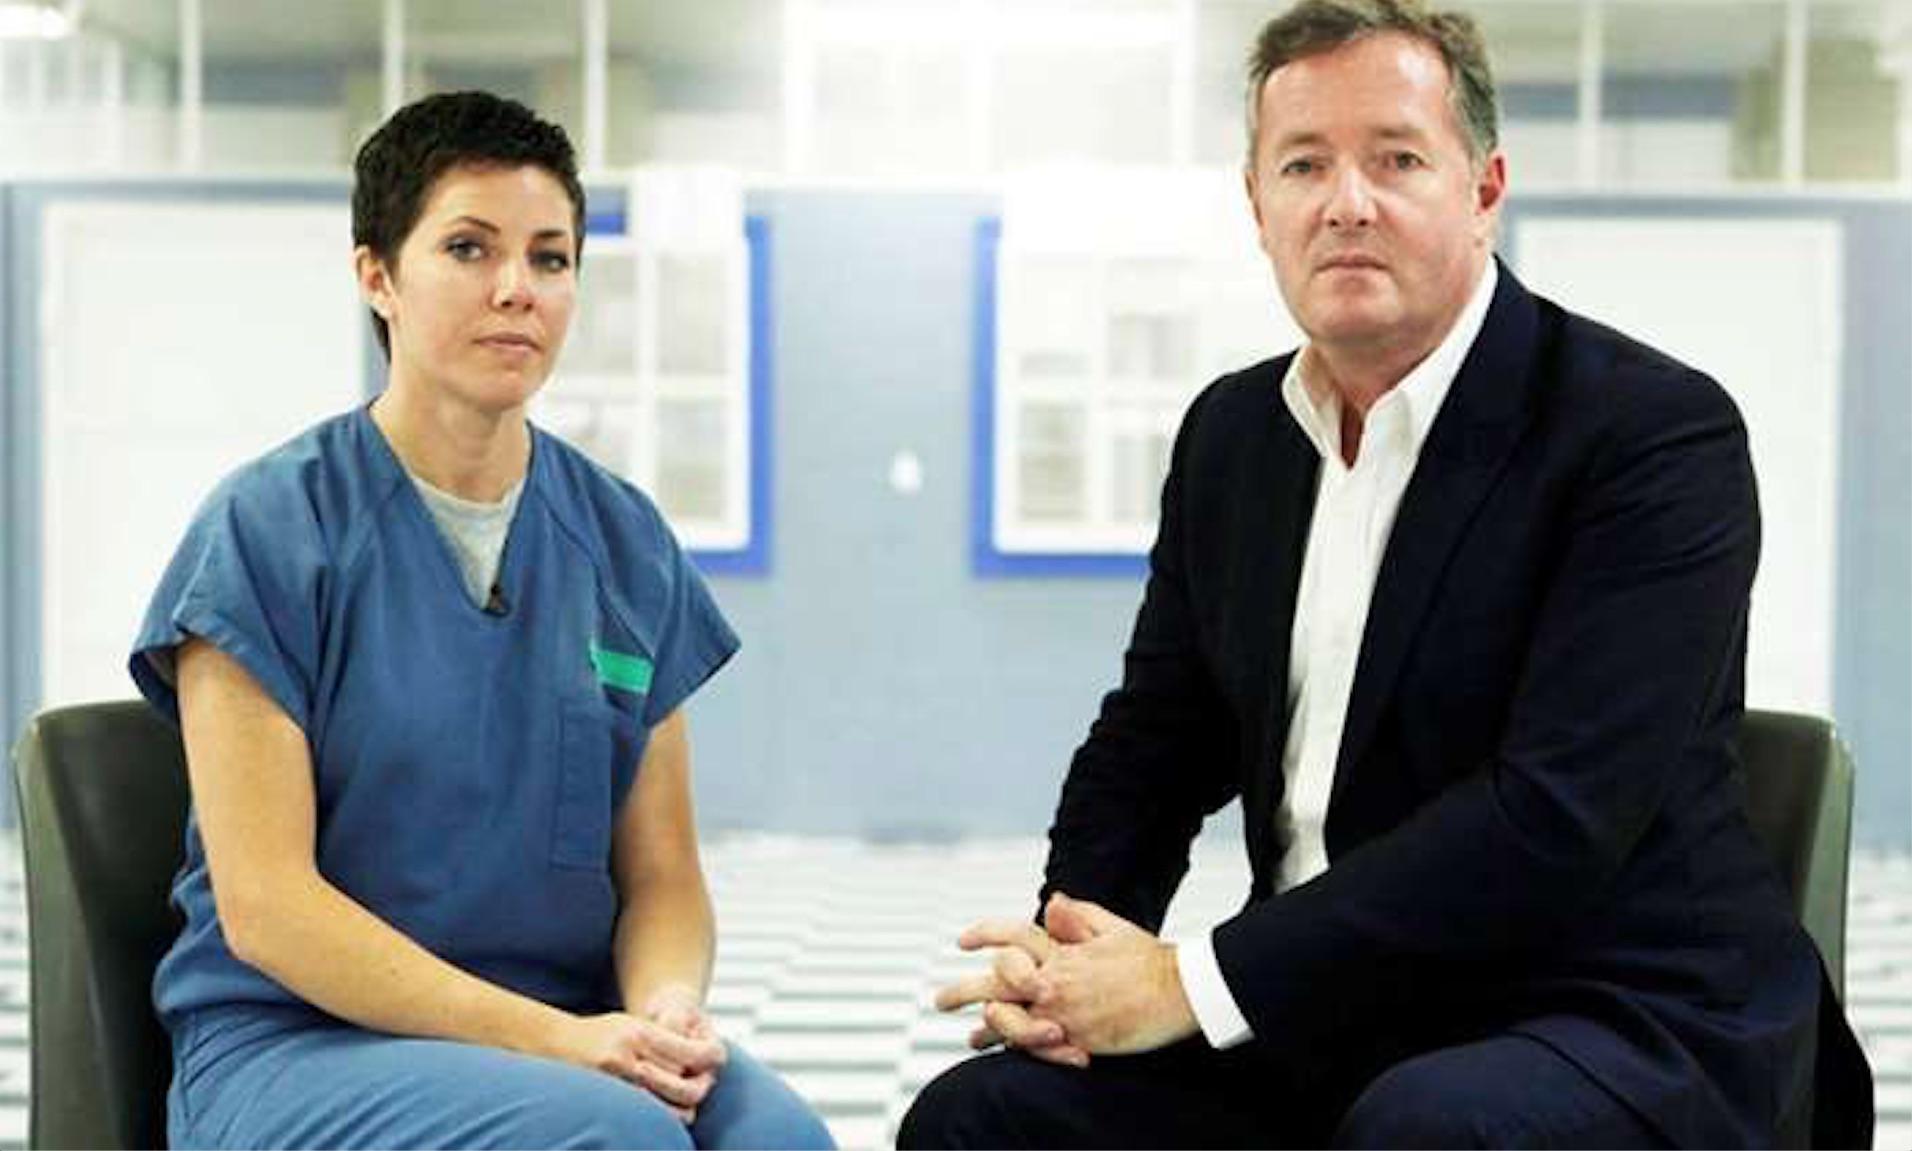 Killer Women With Piers Morgan Tv Series 2016 2017 Photo Gallery Imdb Phil reviews a letter erin caffey wrote her father in prison. killer women with piers morgan tv